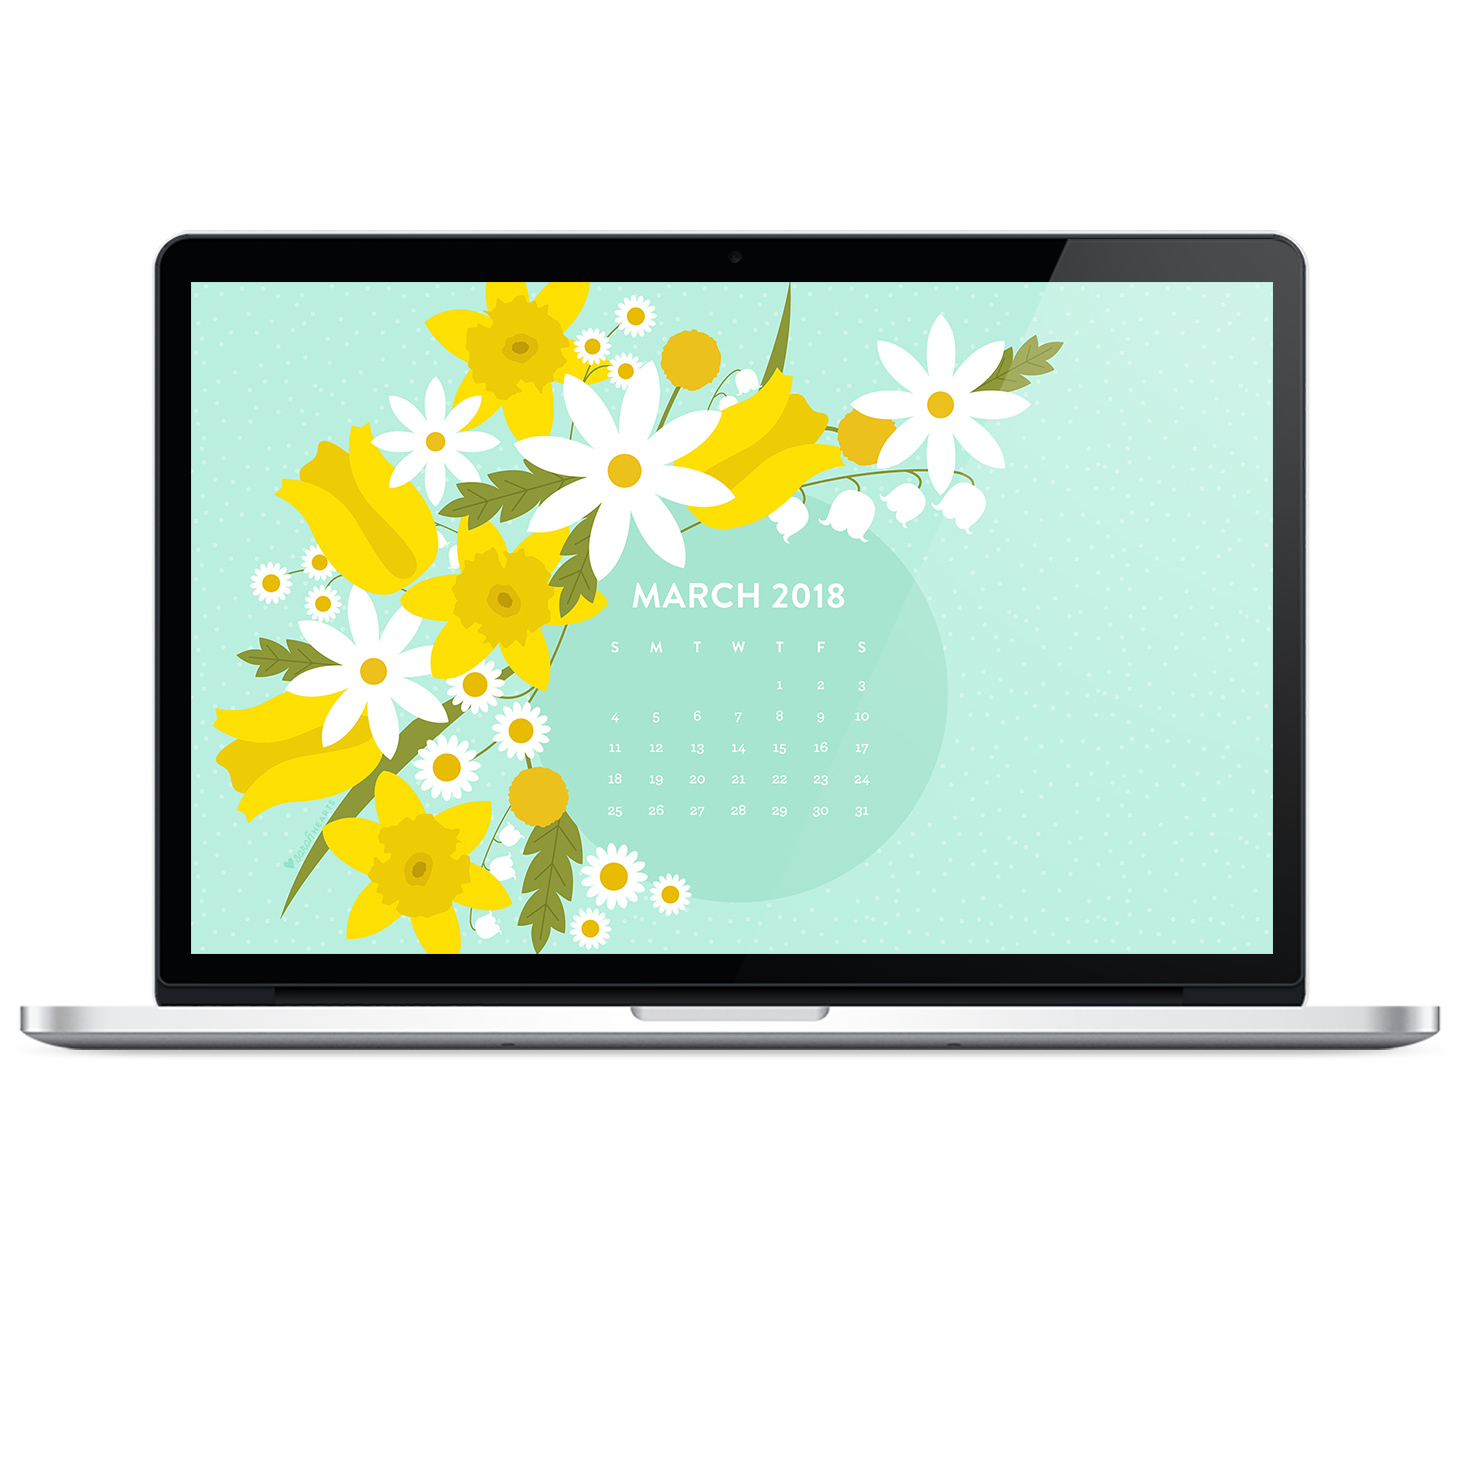 Spring floral wallpaper with April 2018 calendar